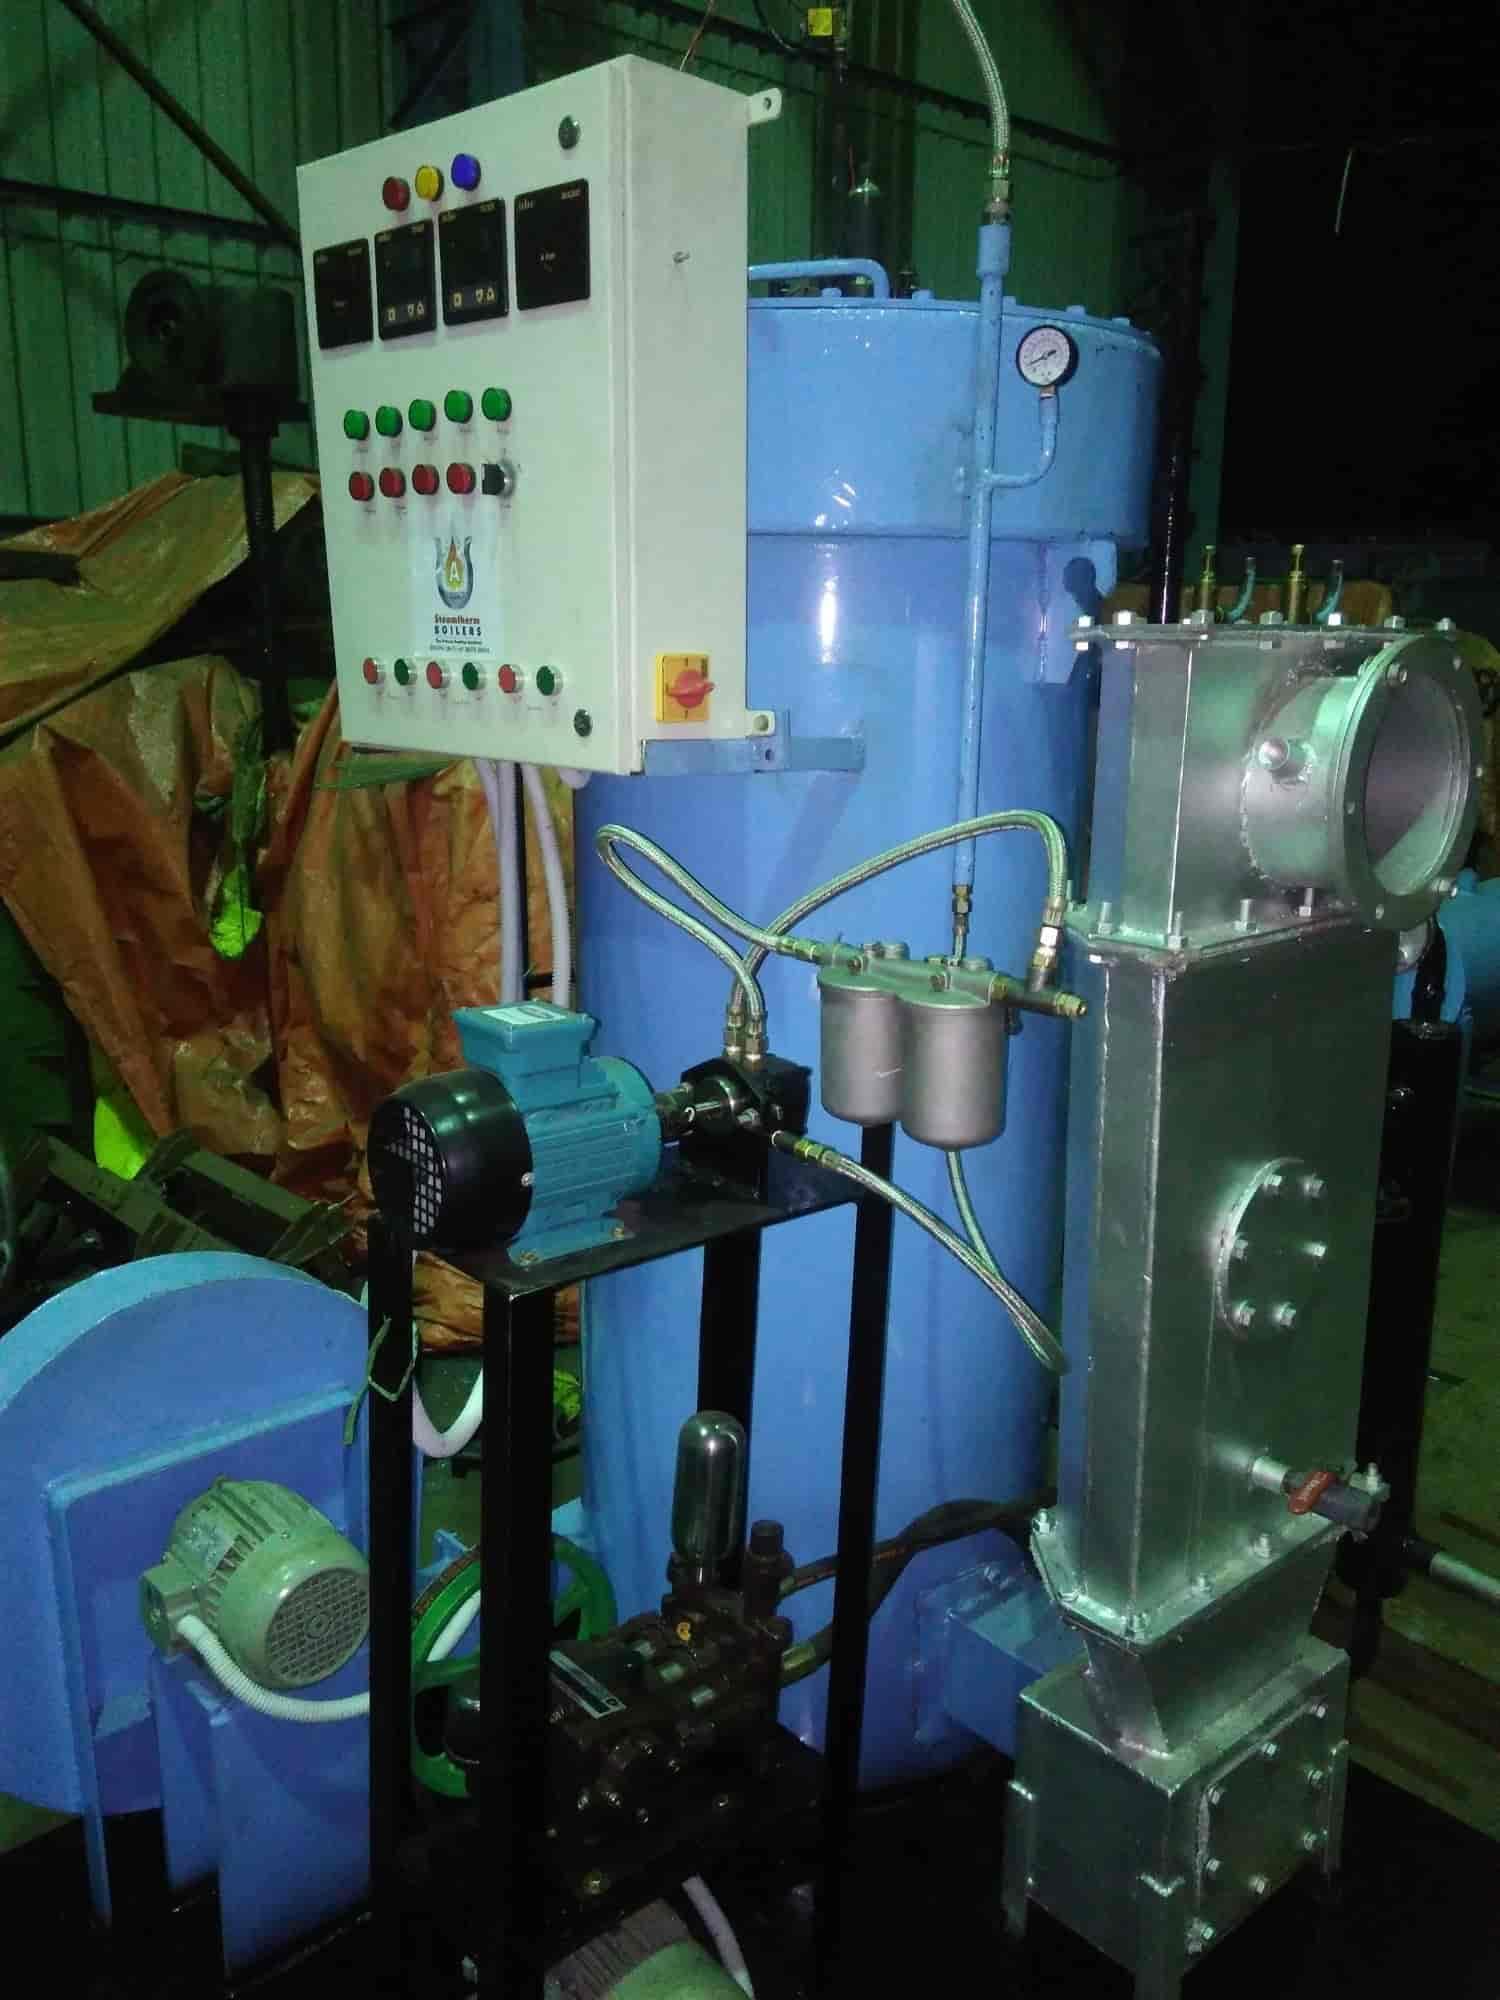 Steamtherm Boilers Photos, Govindpura, Bhopal- Pictures & Images ...